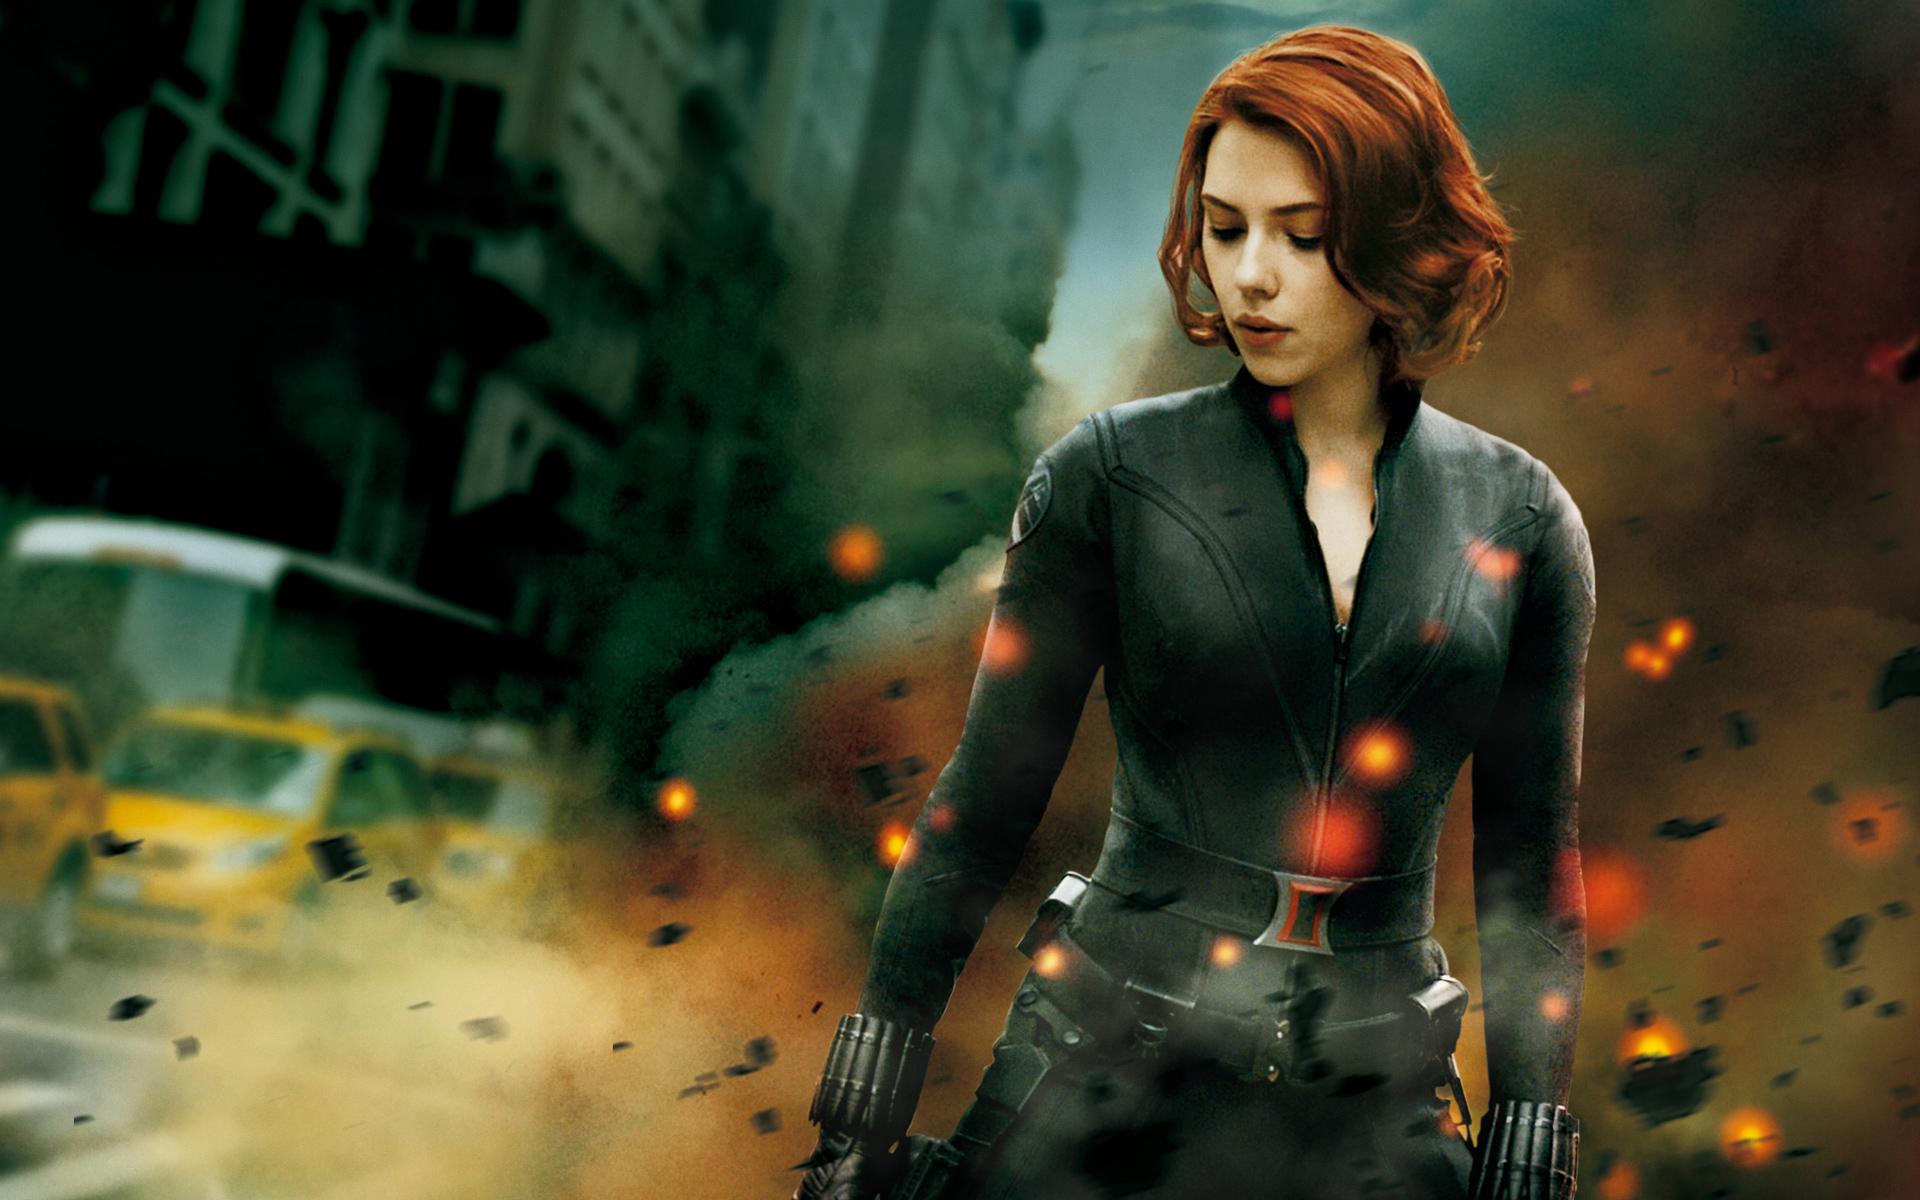 The Avengers Black Widow Wallpaper 1501847 Hd Wallpaper